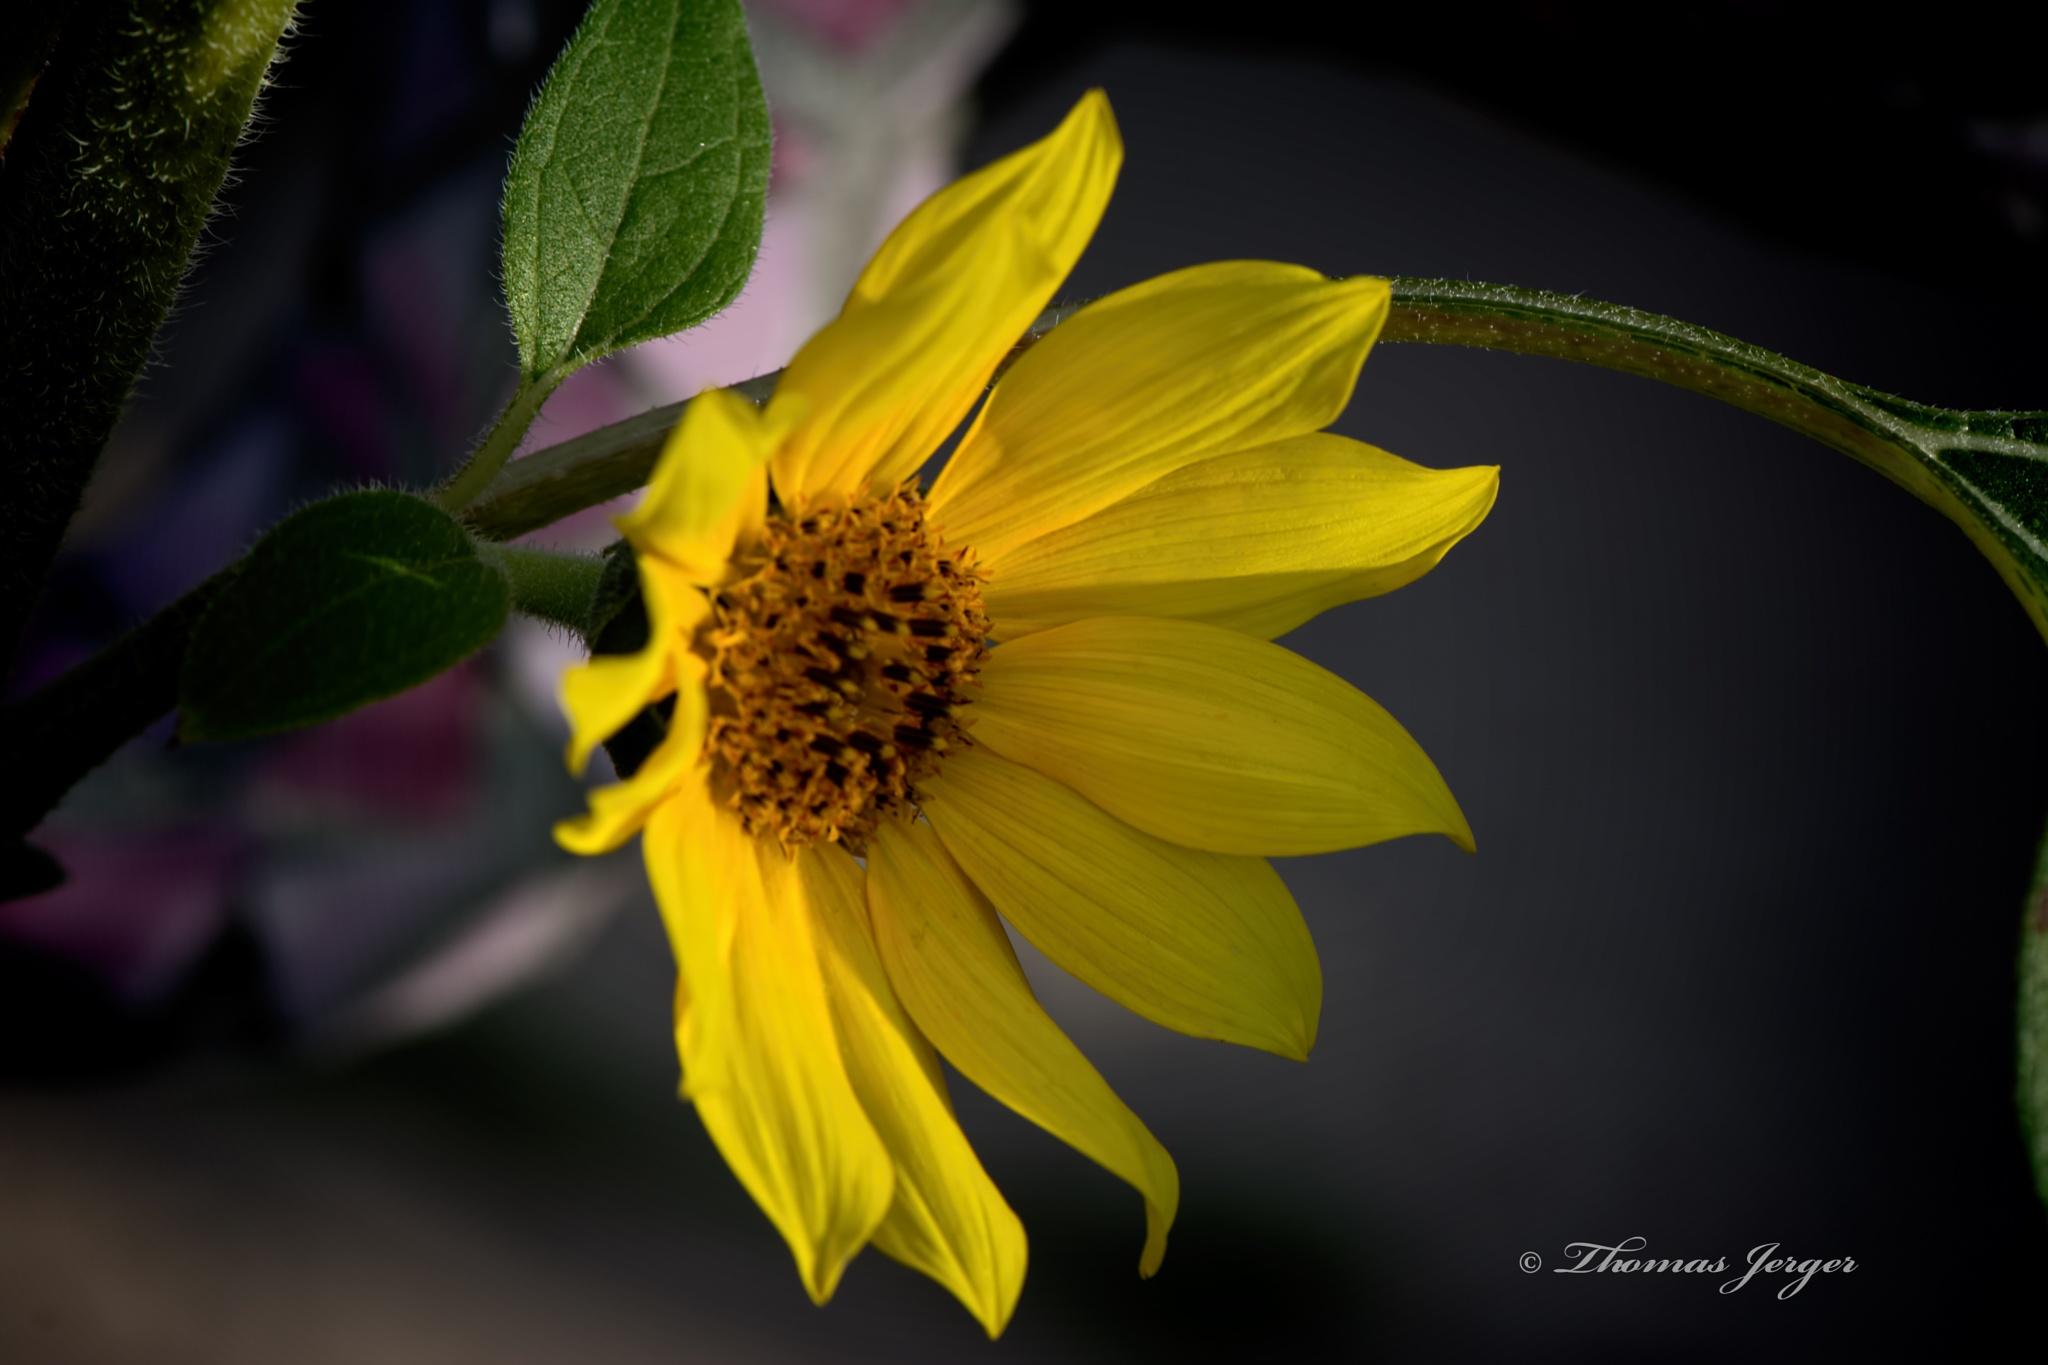 Yellow Sunflower Opening 1030 by ThomasJerger